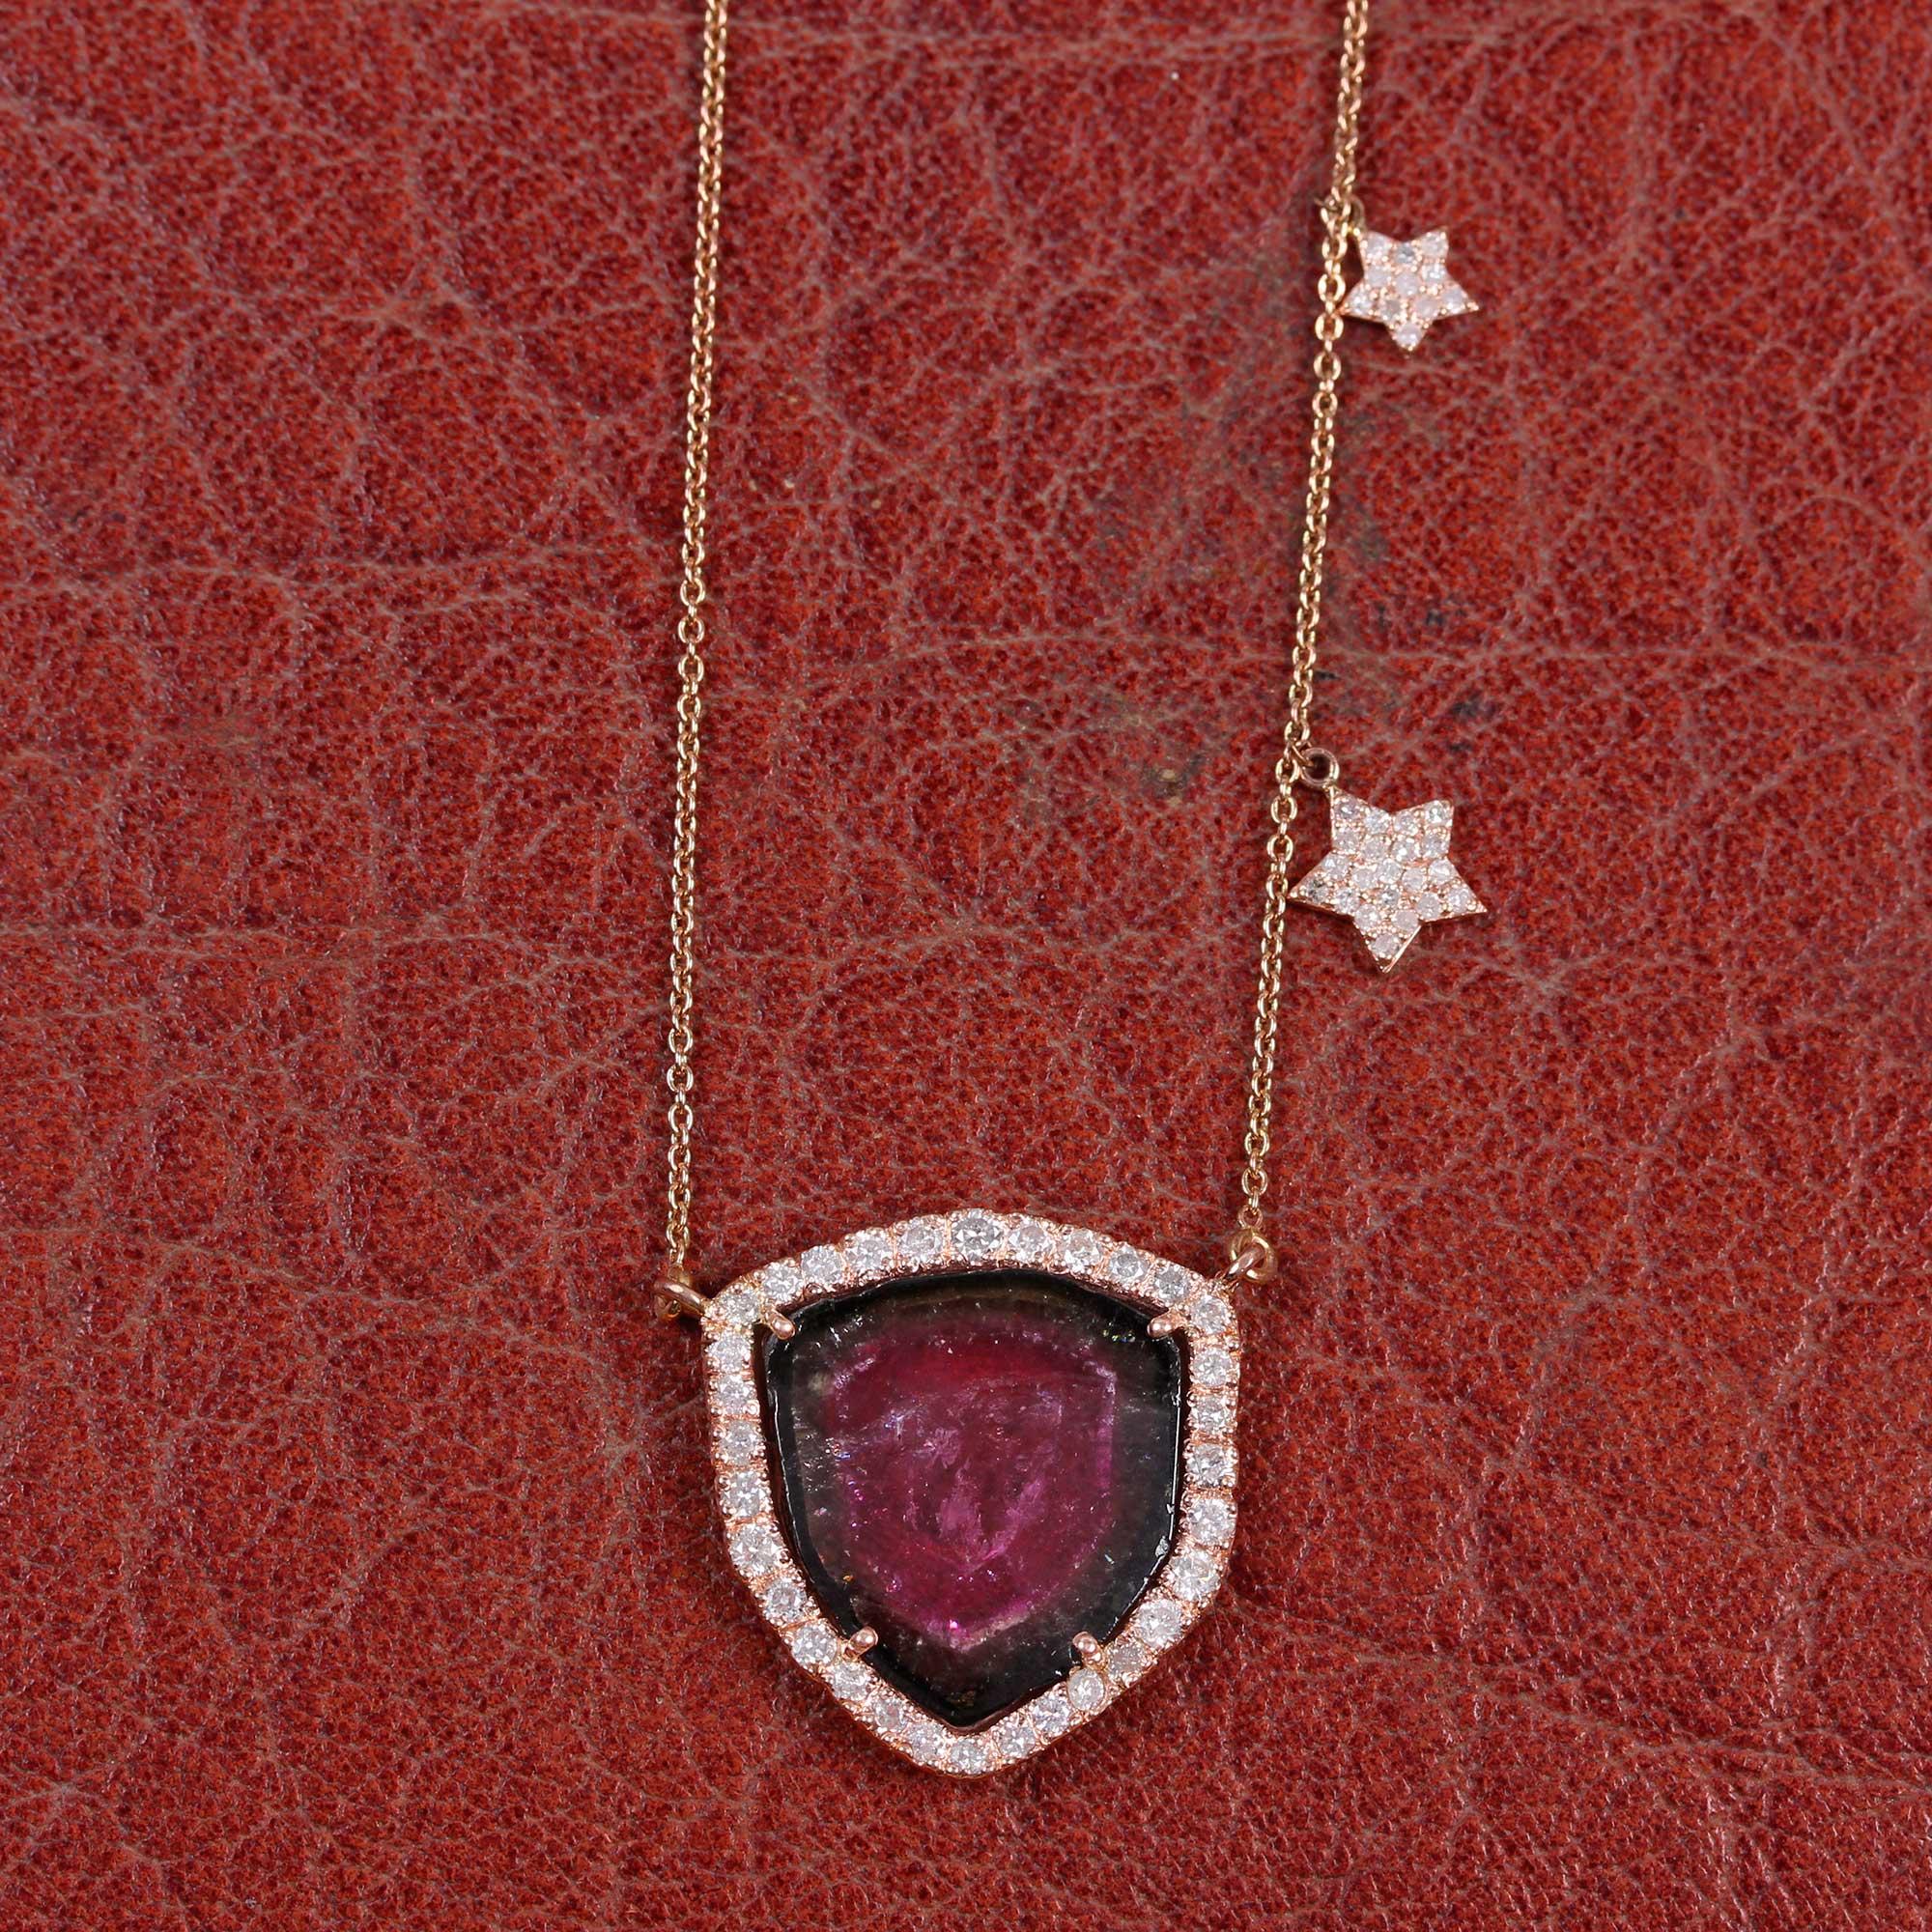 Tourmaline Gemstone 14K Solid Gold Pendant Necklace Pave Diamond Jewelry